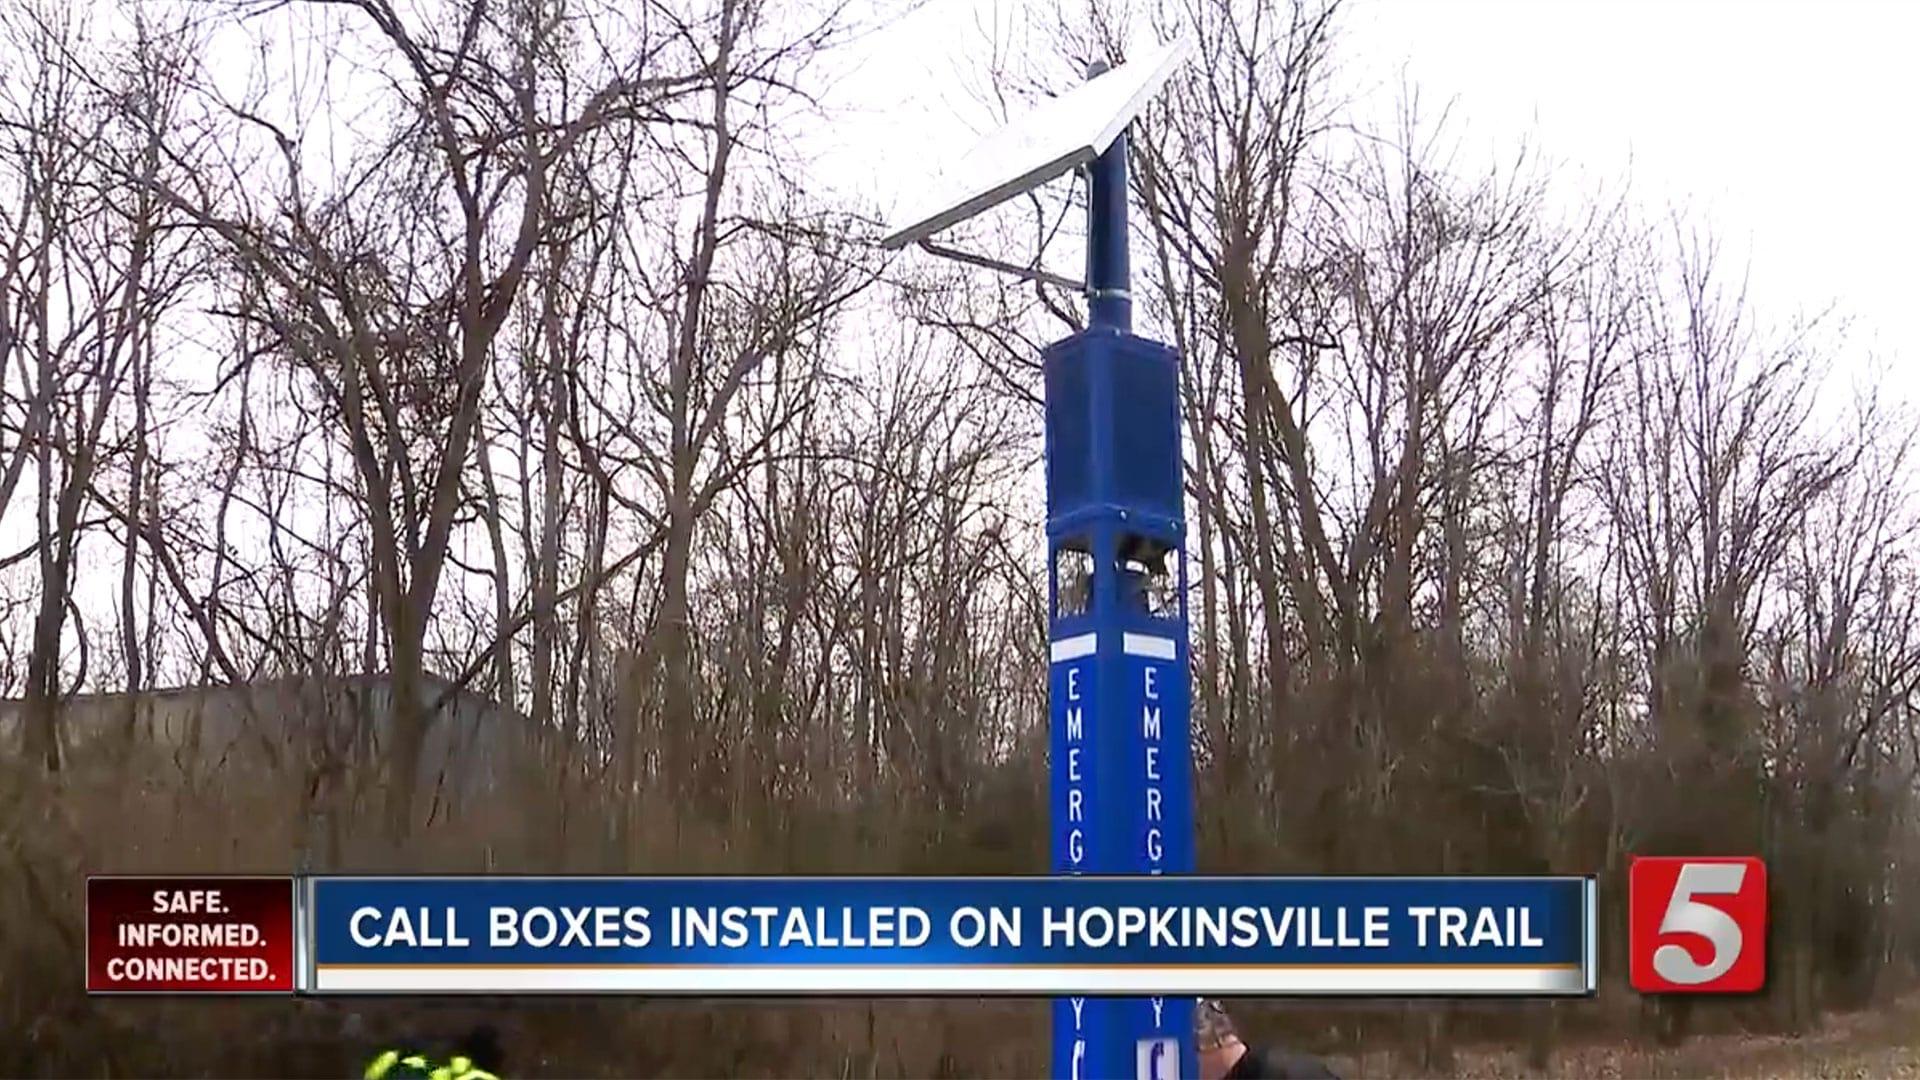 Hopkinsville-CASE-Installation-02-min